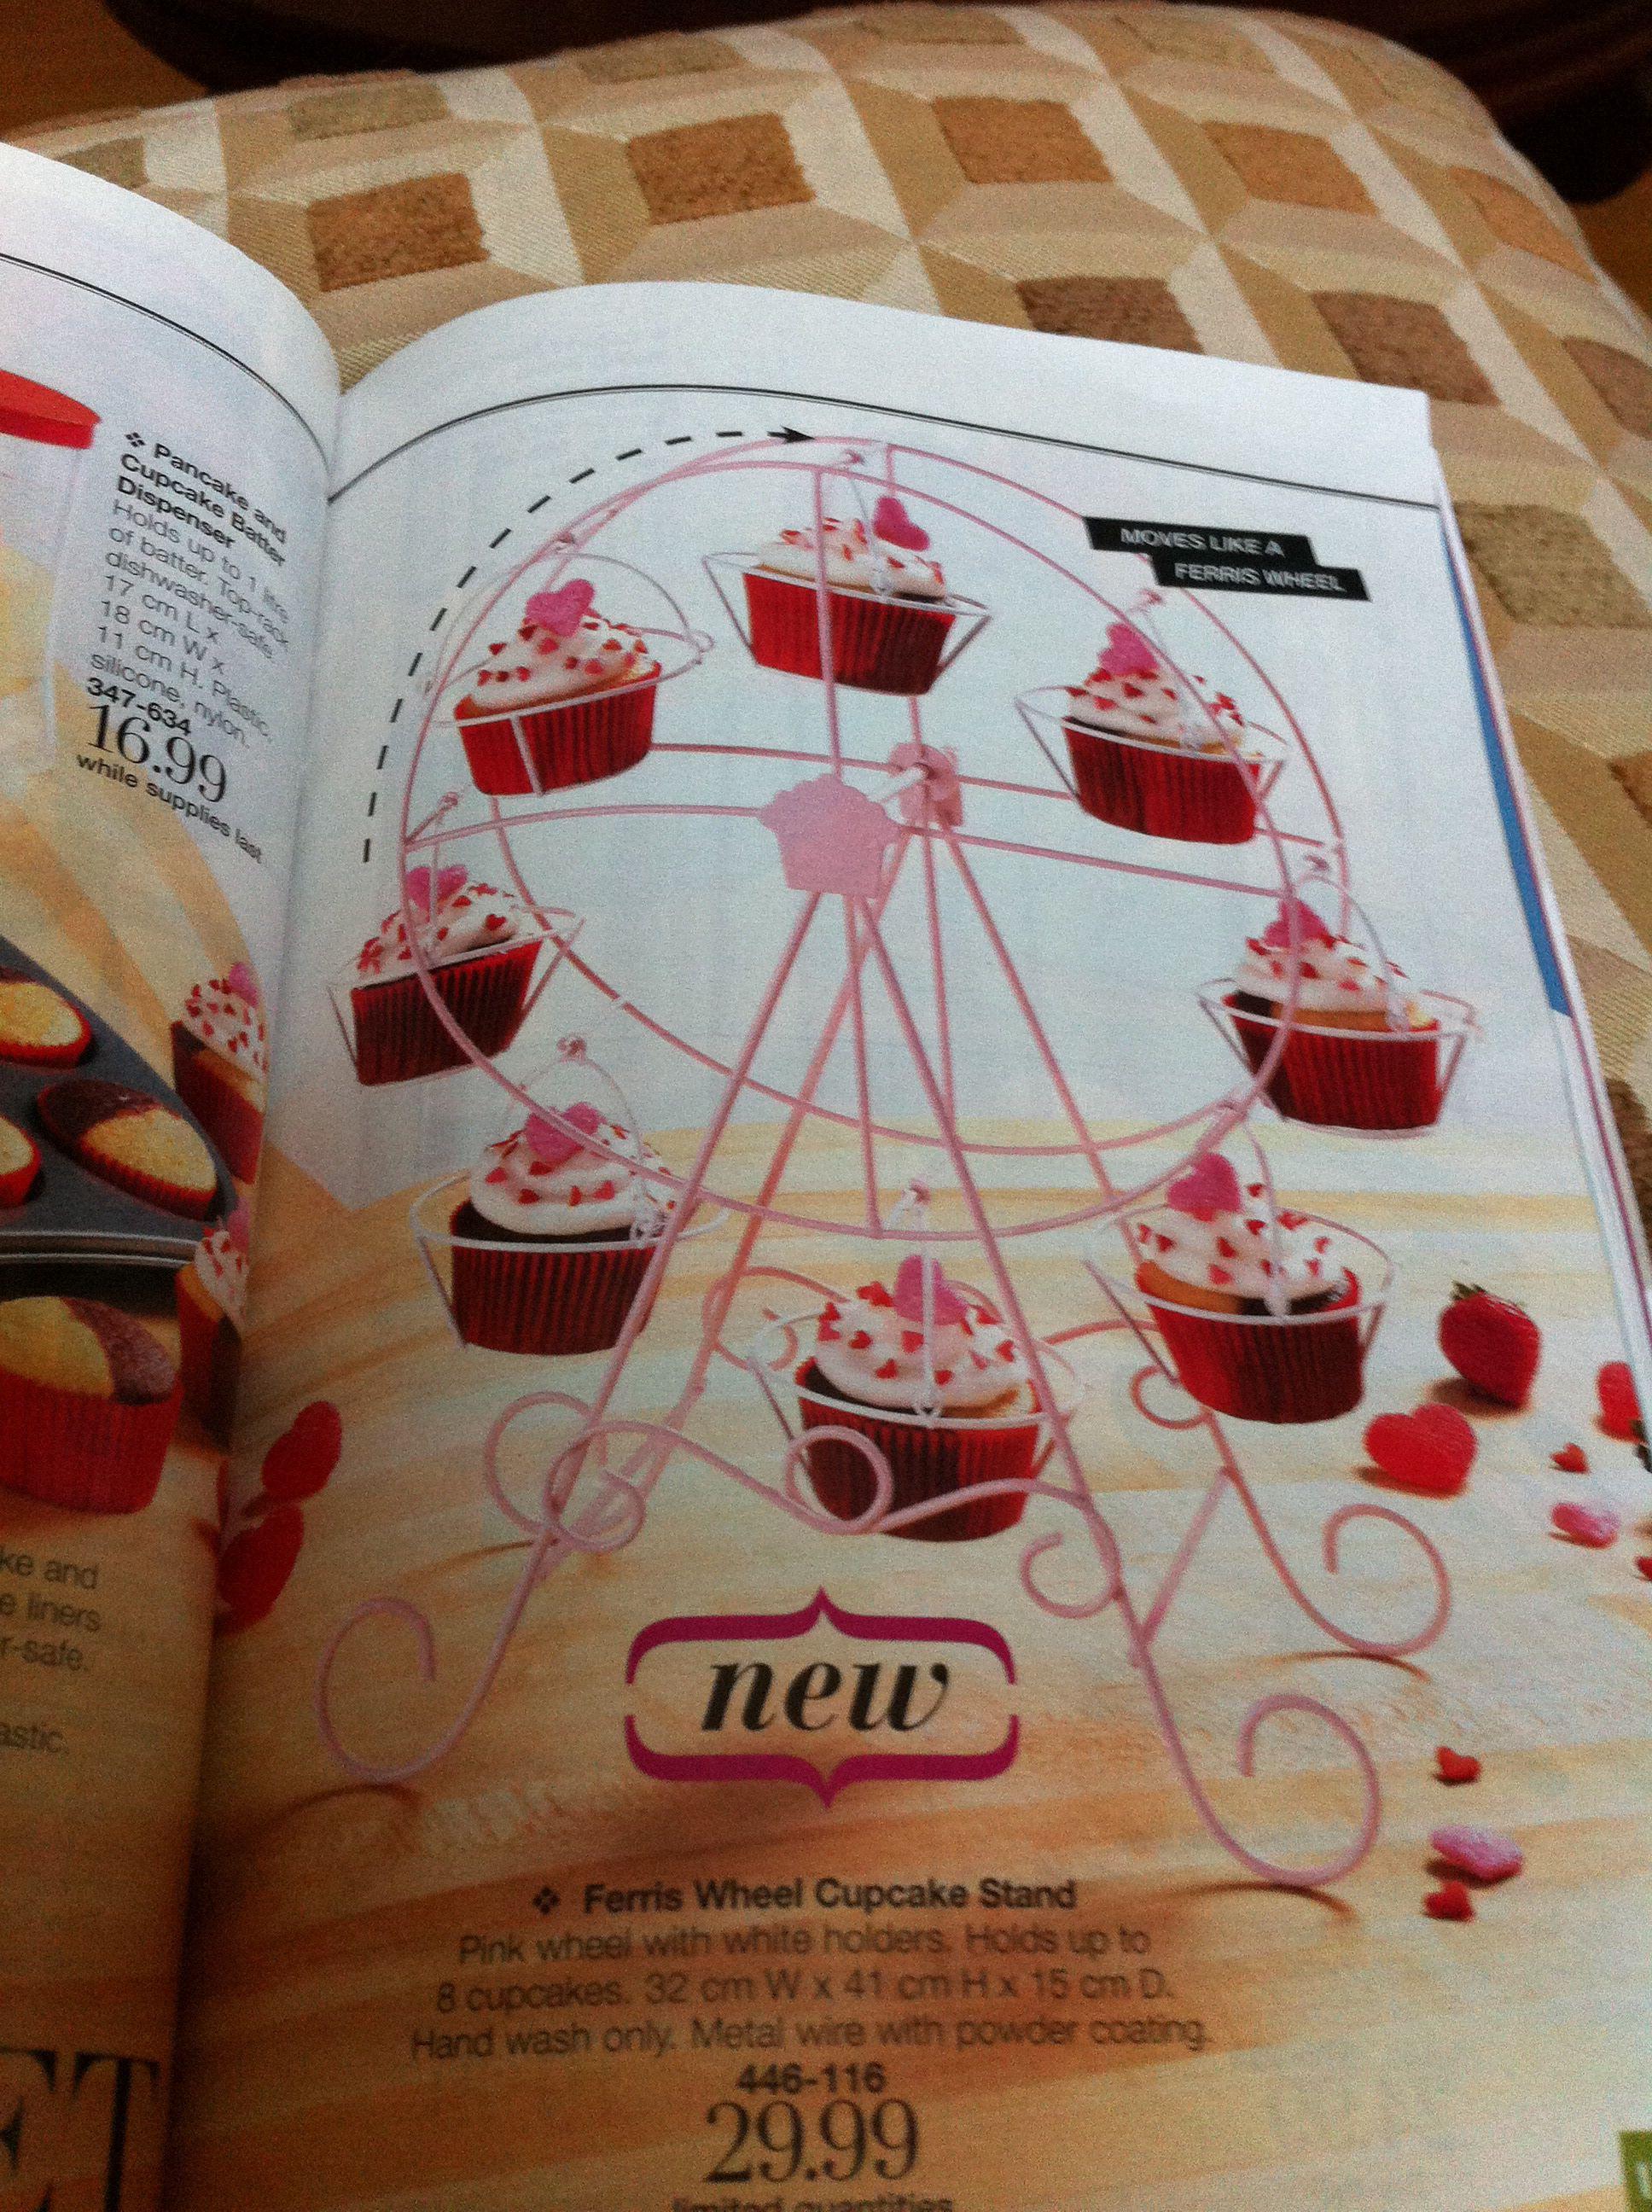 Cupcake holder Ferris wheel